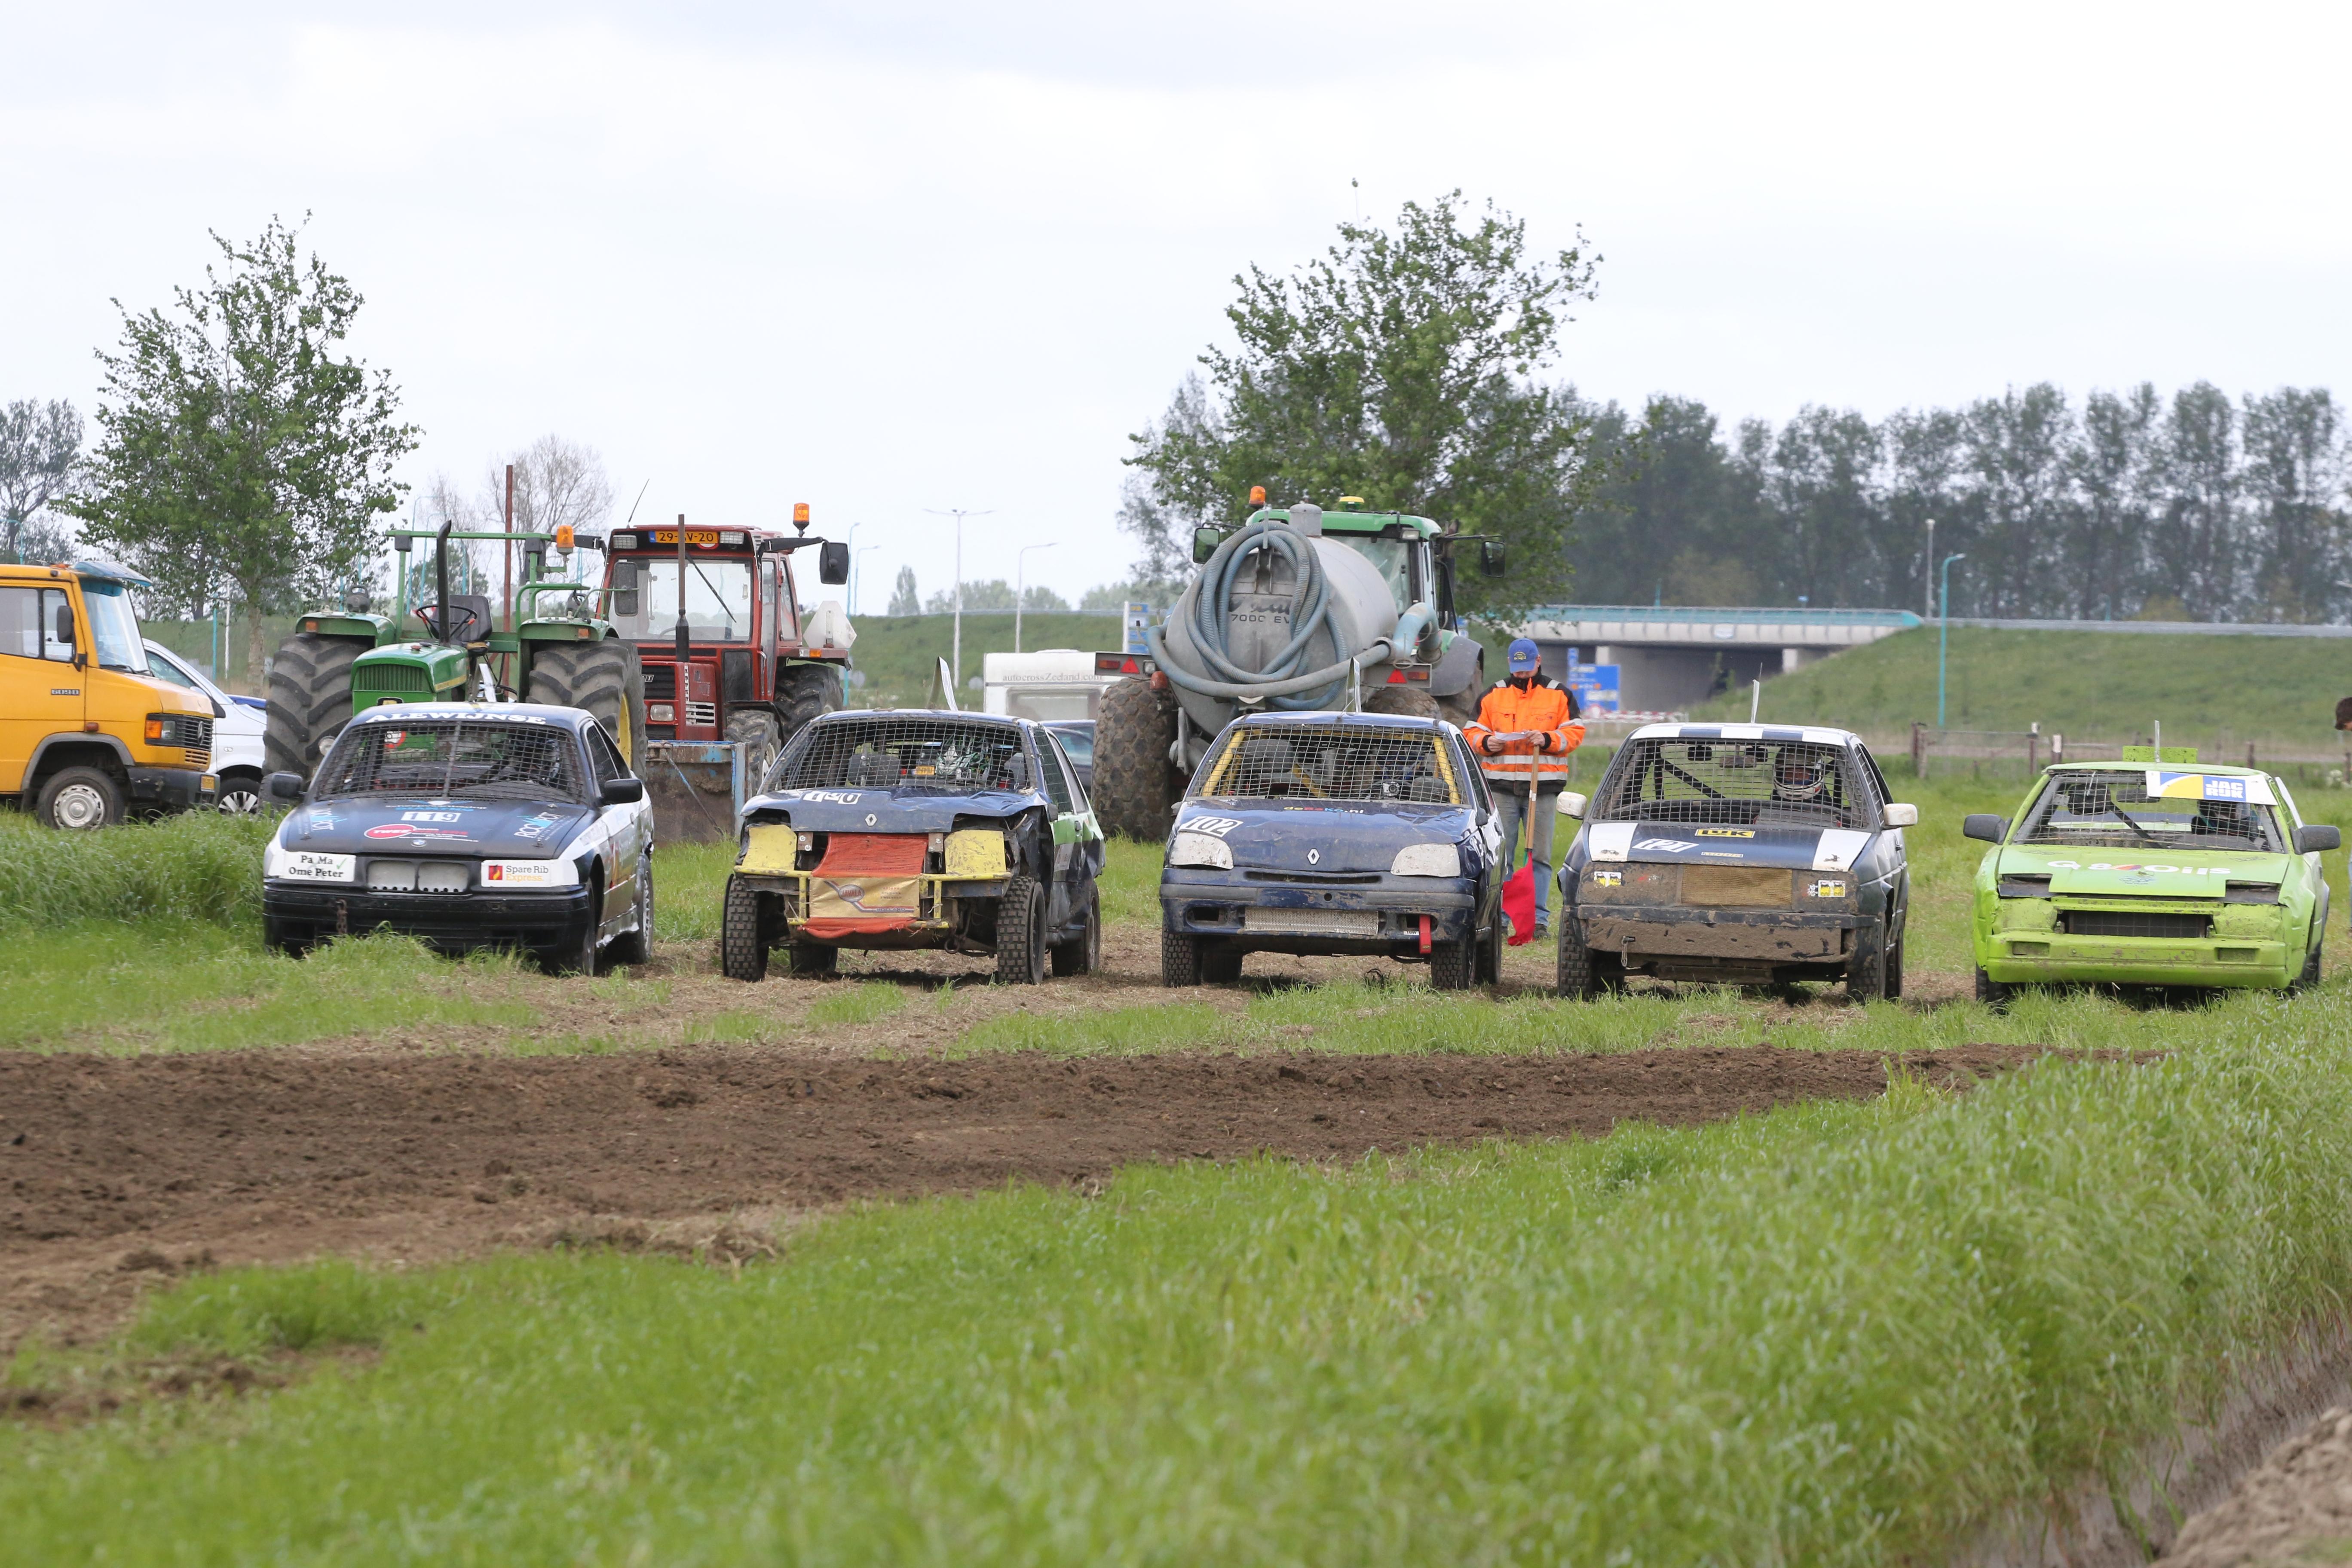 autocross sluiskil 14-5-2016 106